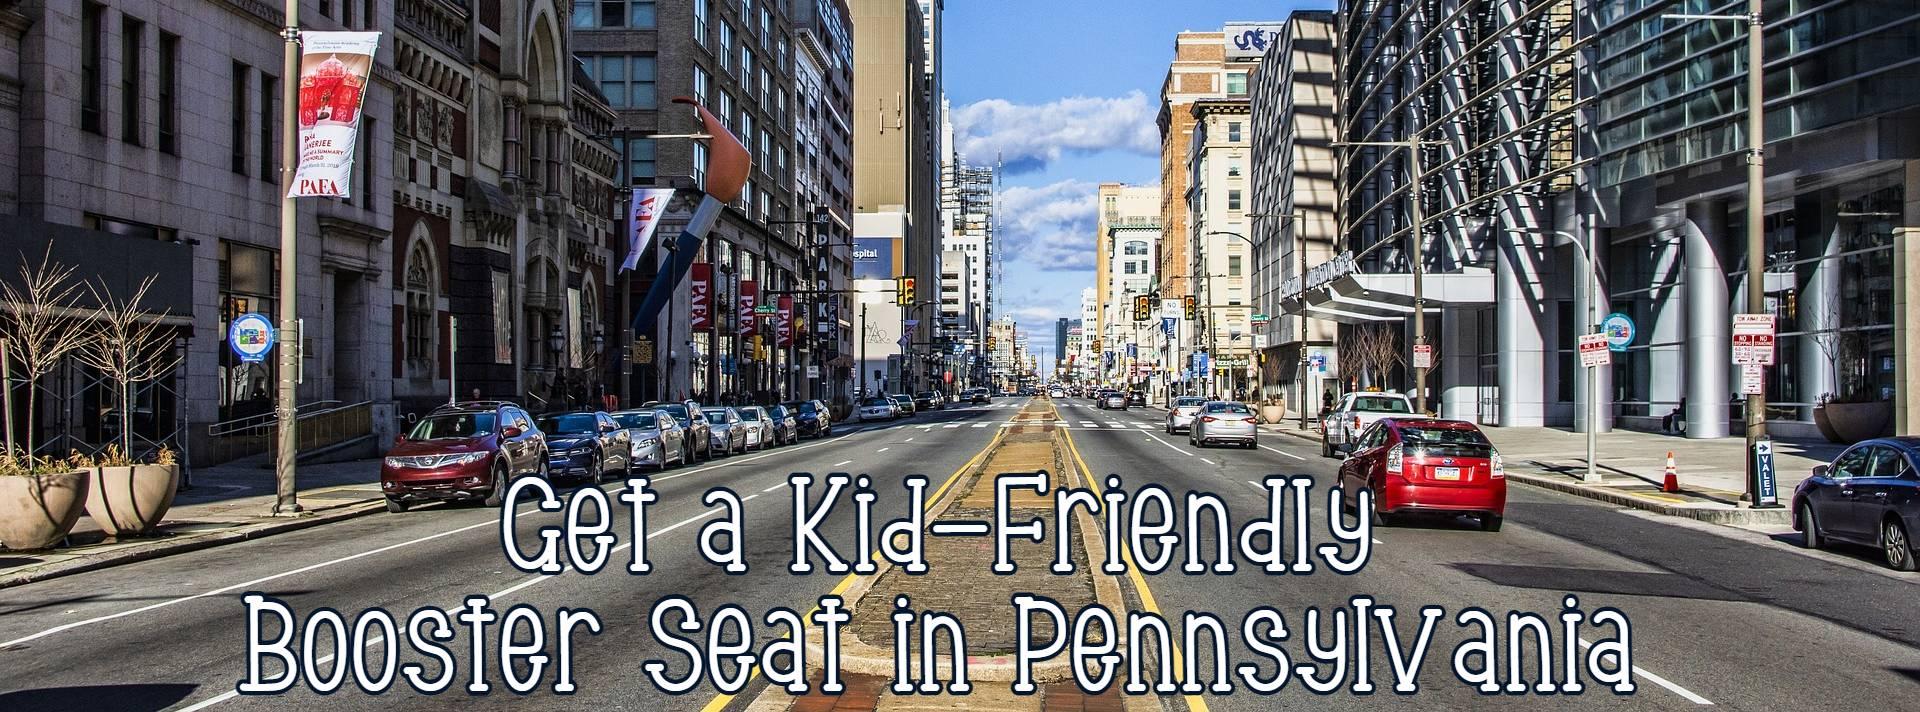 Pennsylvania car booster seat